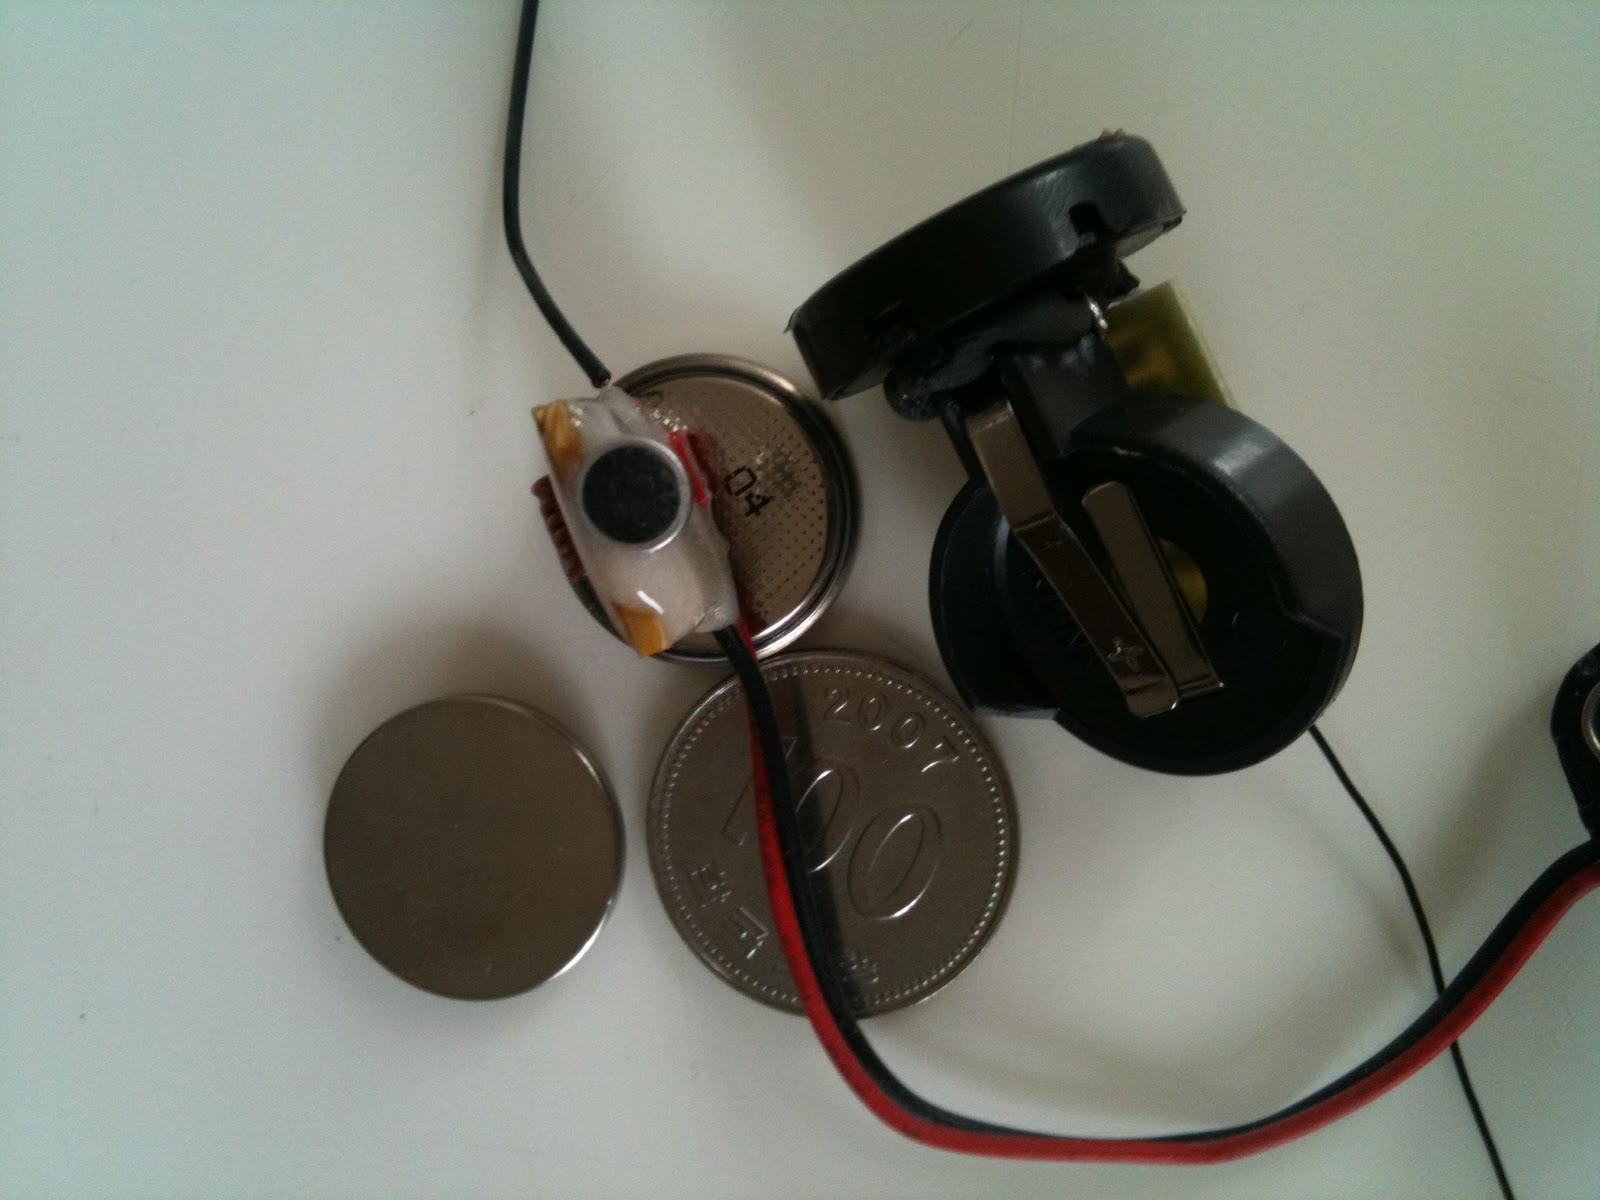 70ff70c4928 쉼터사랑방 | 초소형 무선도청기 - Daum 카페